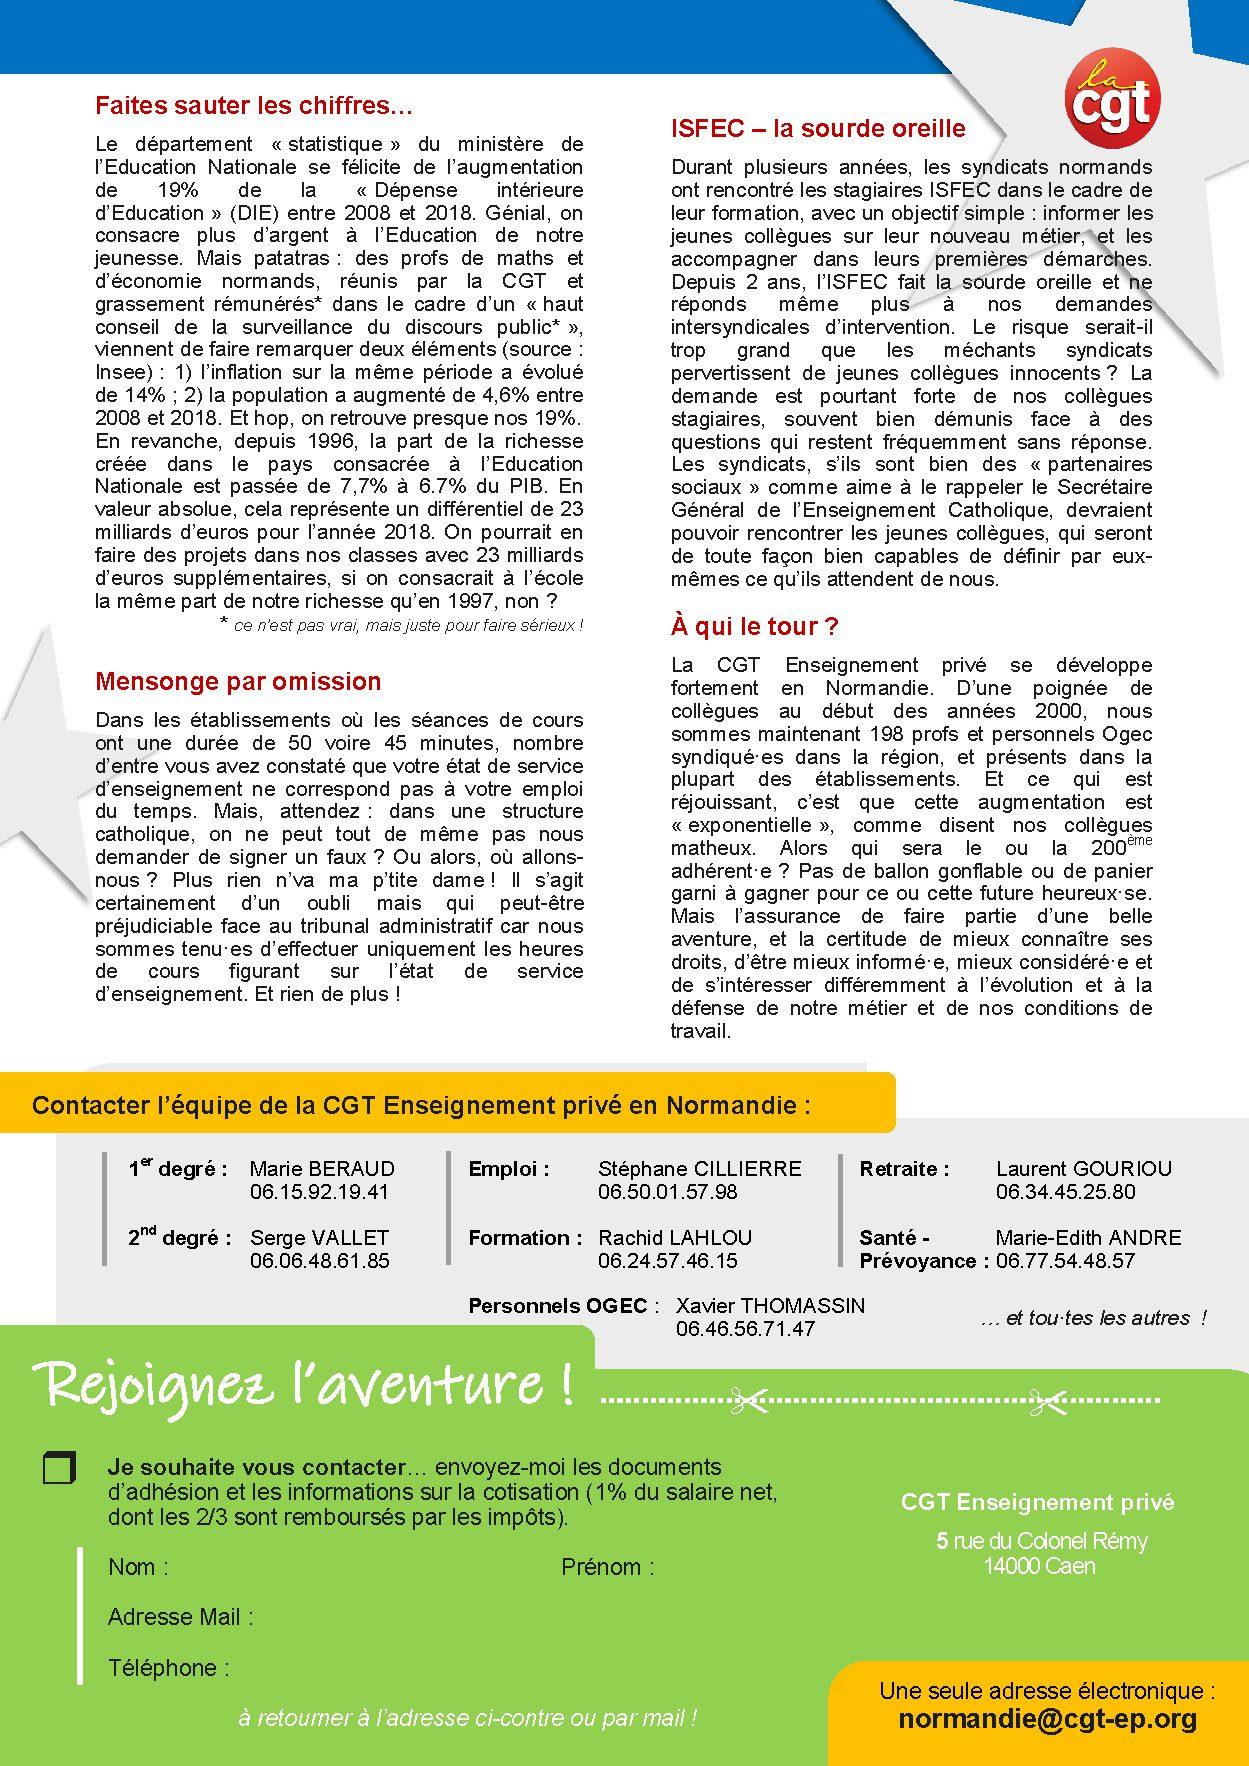 2019-11-10_les indispensables_CGT_Normandie_3_Page_2